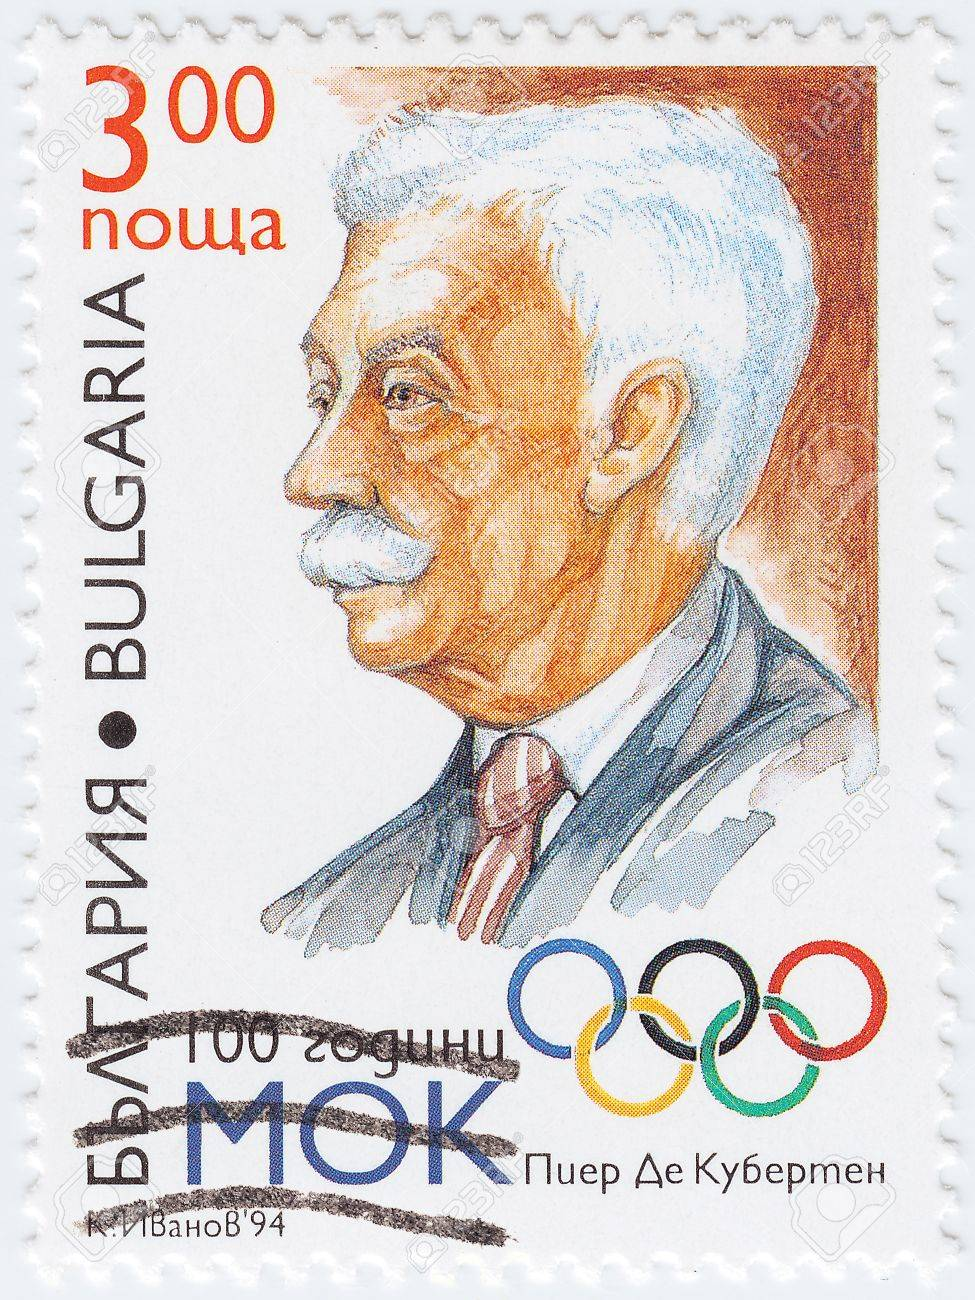 BULGARIA - CIRCA 1994 : stamp printed in Bulgaria showing Pierre De Cubertain, circa 1994 Stock Photo - 15767635